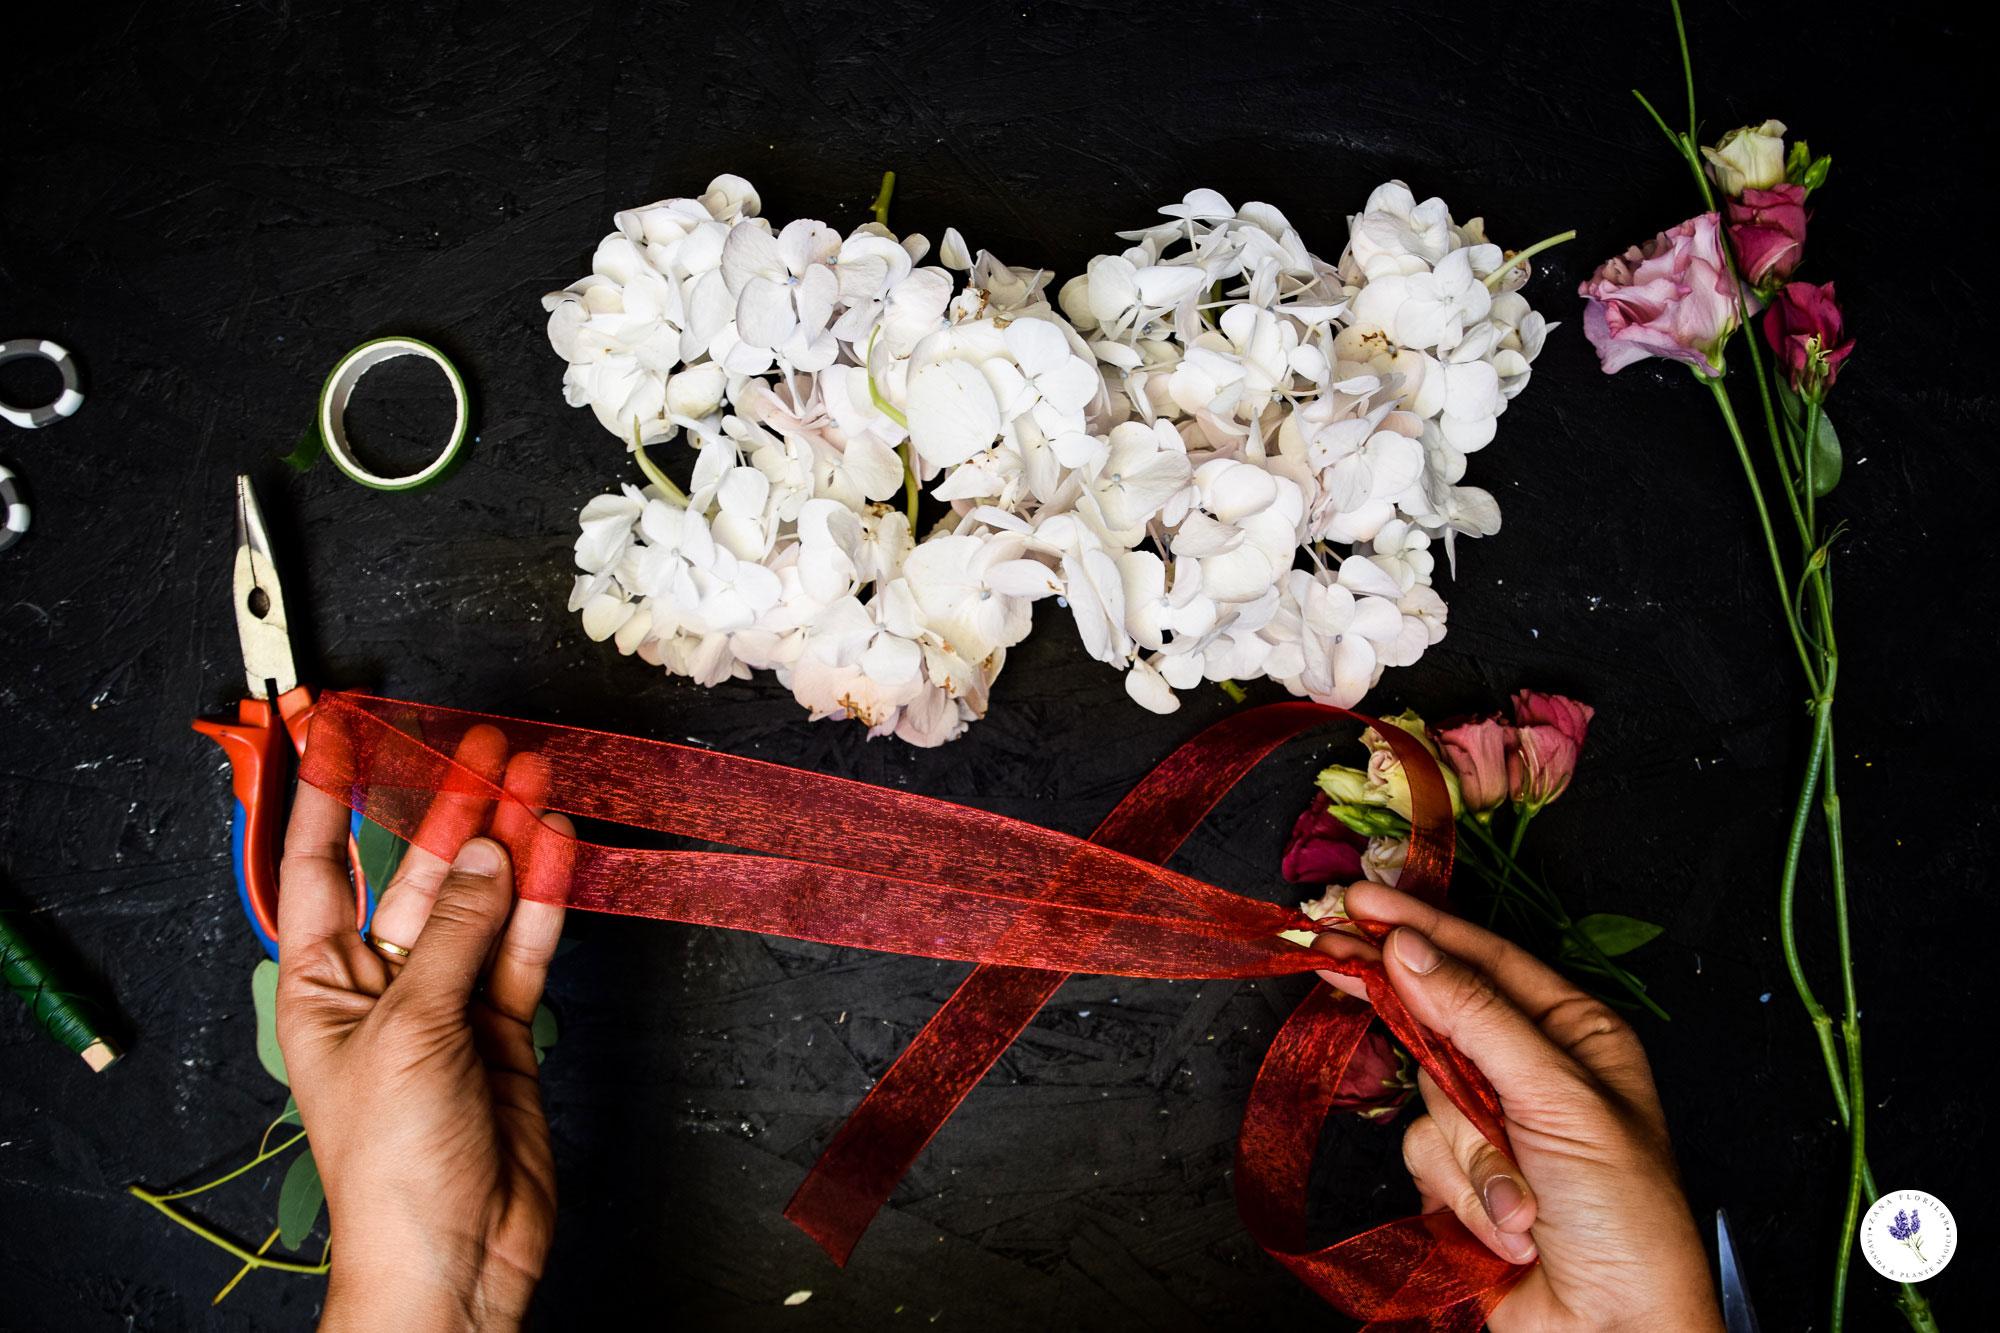 How to Make a DIY Flower Crown in 3 Easy Steps - Handmade Tutorial for Creative People #flowers #diy #tutorial #diytutorial #flowercrown #flowerwreath